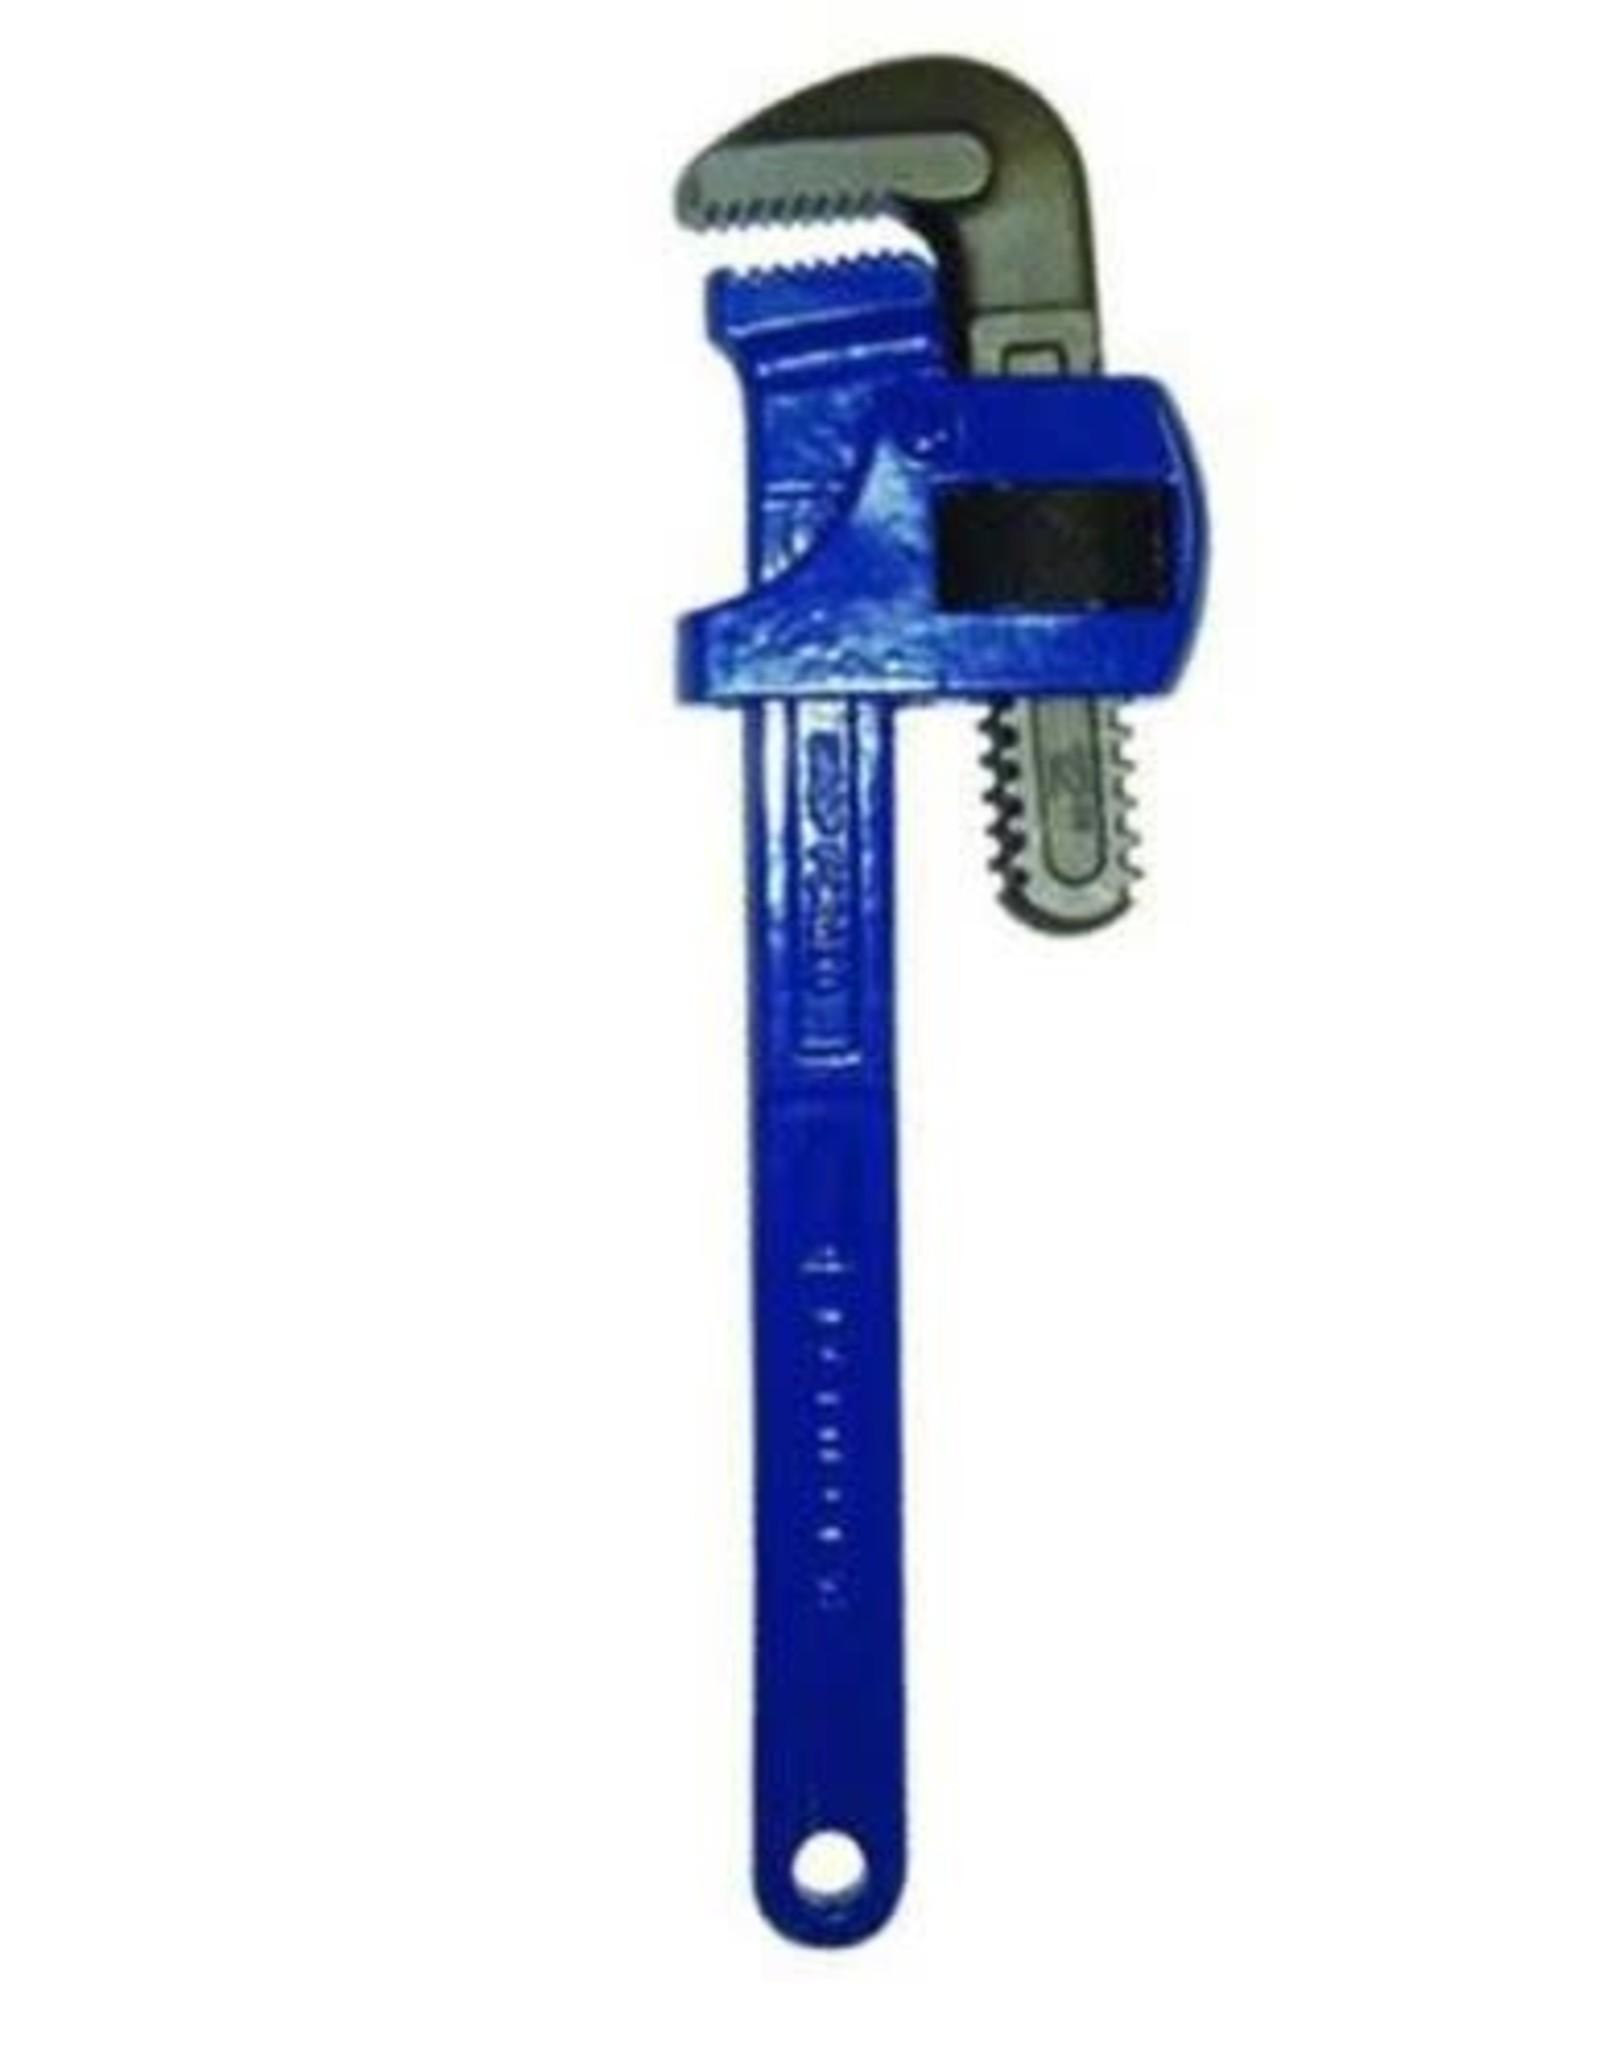 Eclipse Pipe Wrench - Stillson Pattern 350mm